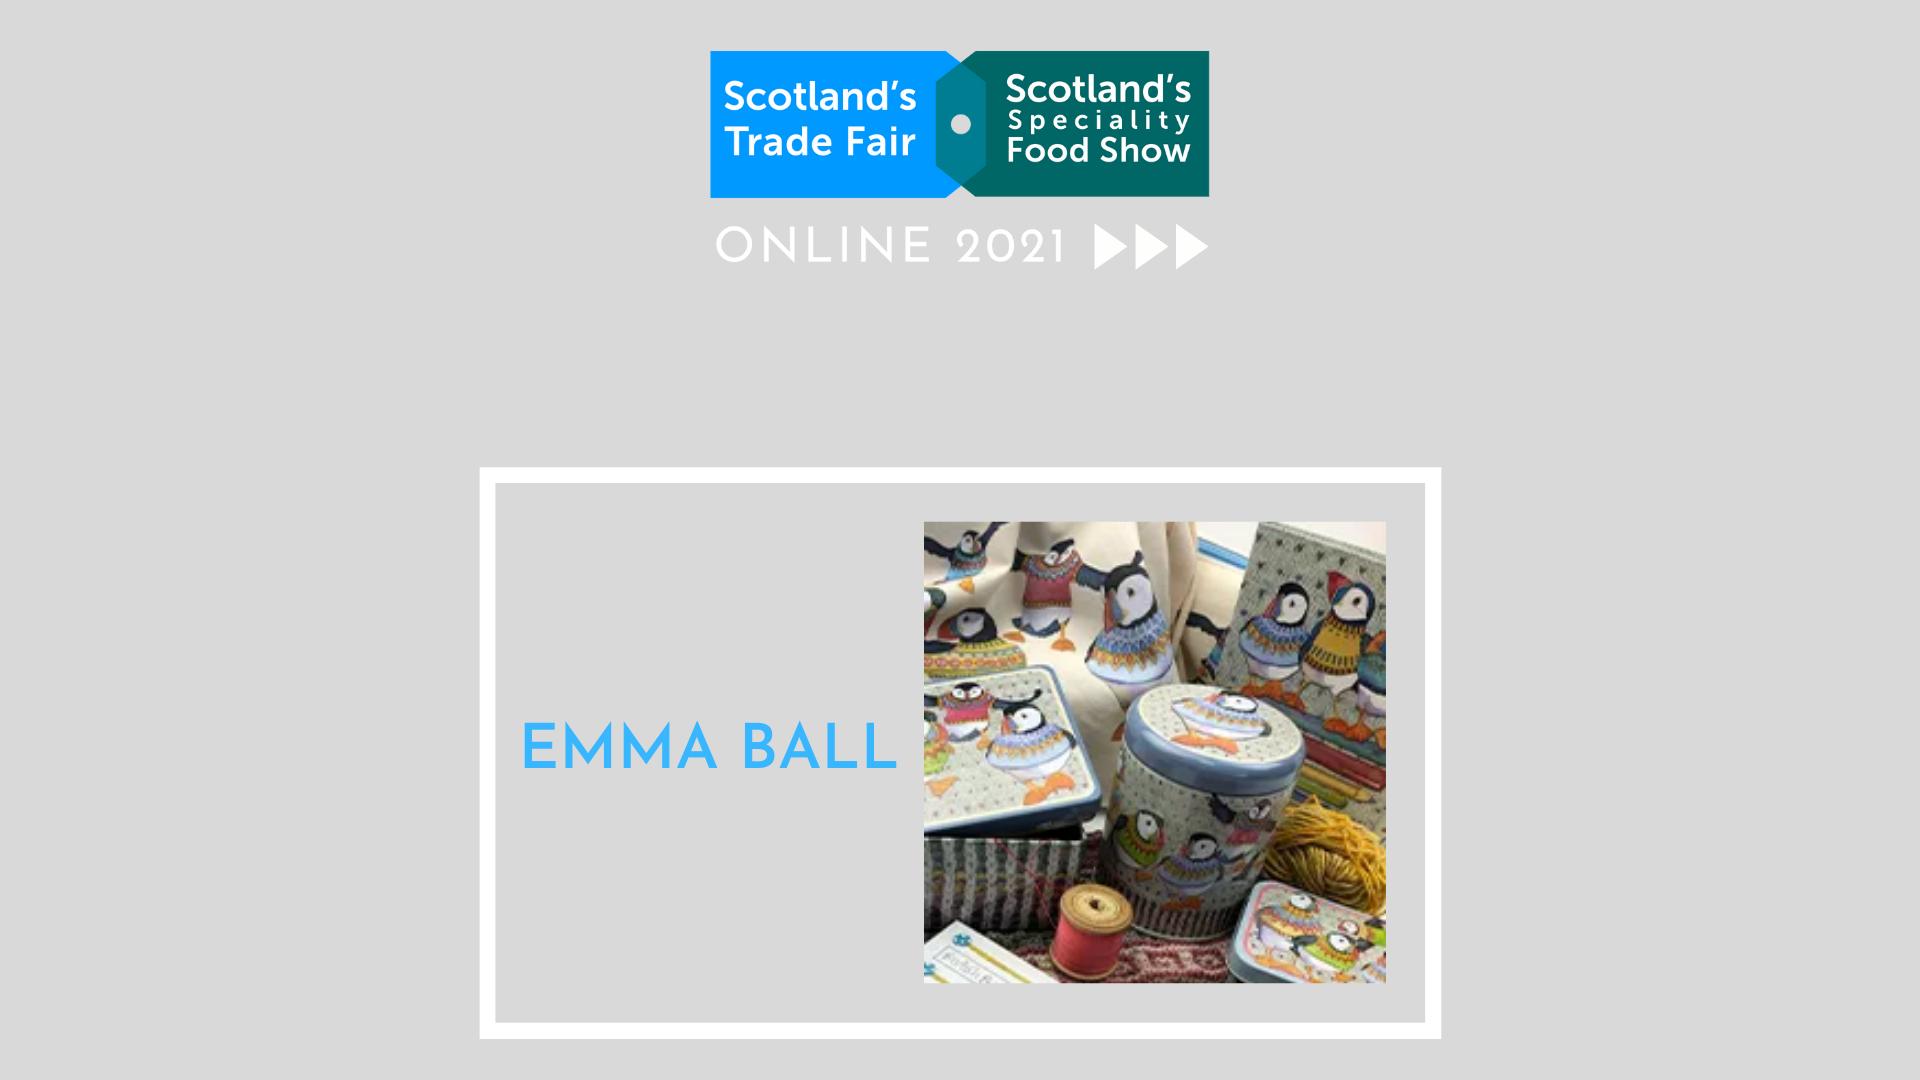 Emma Ball - Live Presentation